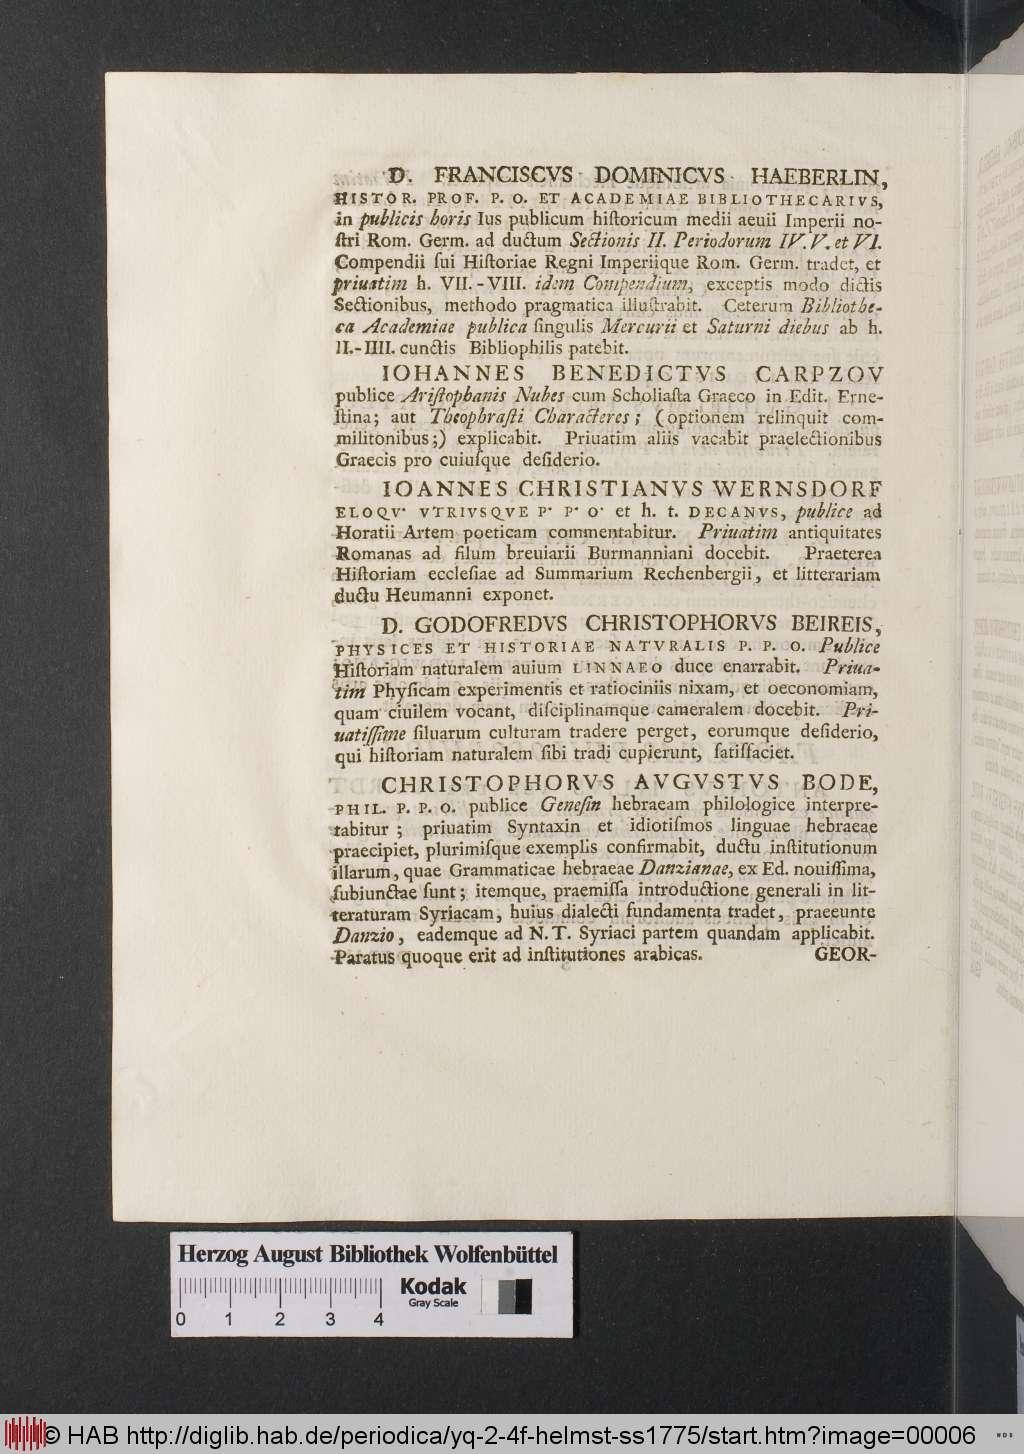 http://diglib.hab.de/periodica/yq-2-4f-helmst-ss1775/00006.jpg